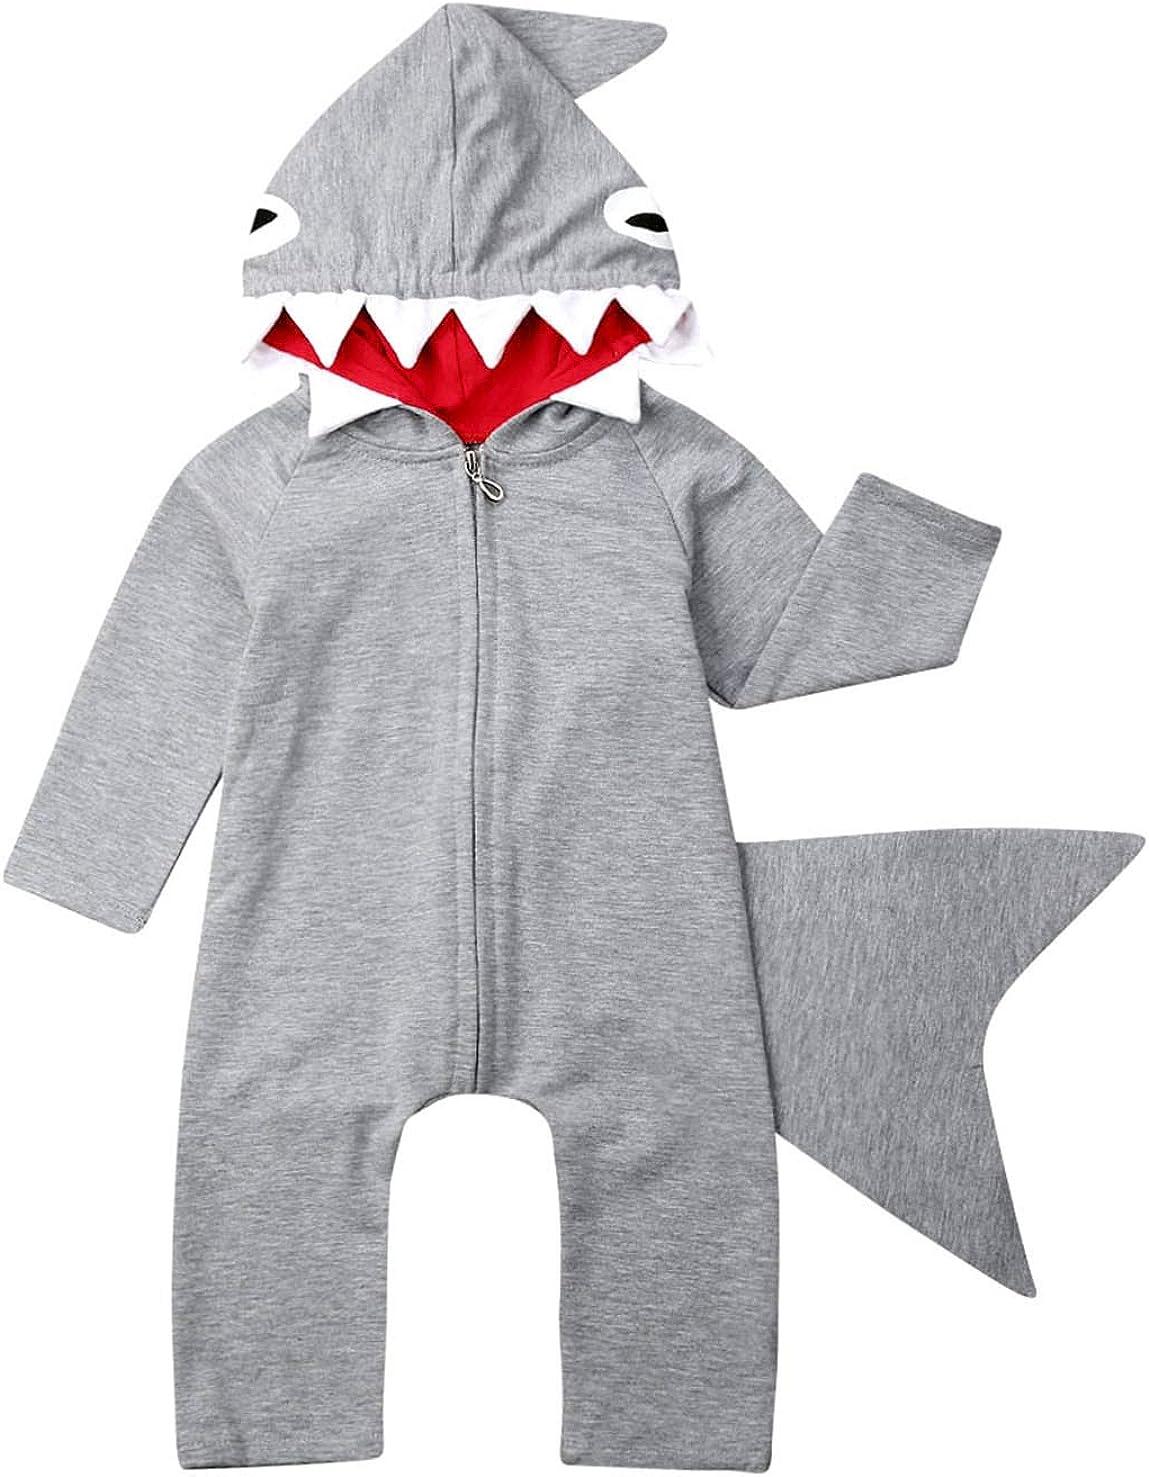 SUNBIBE Newborn Baby Boys Girls Solid Dinosaur Hoodie Rompers Winter with Pocket Warm Jumpsuit